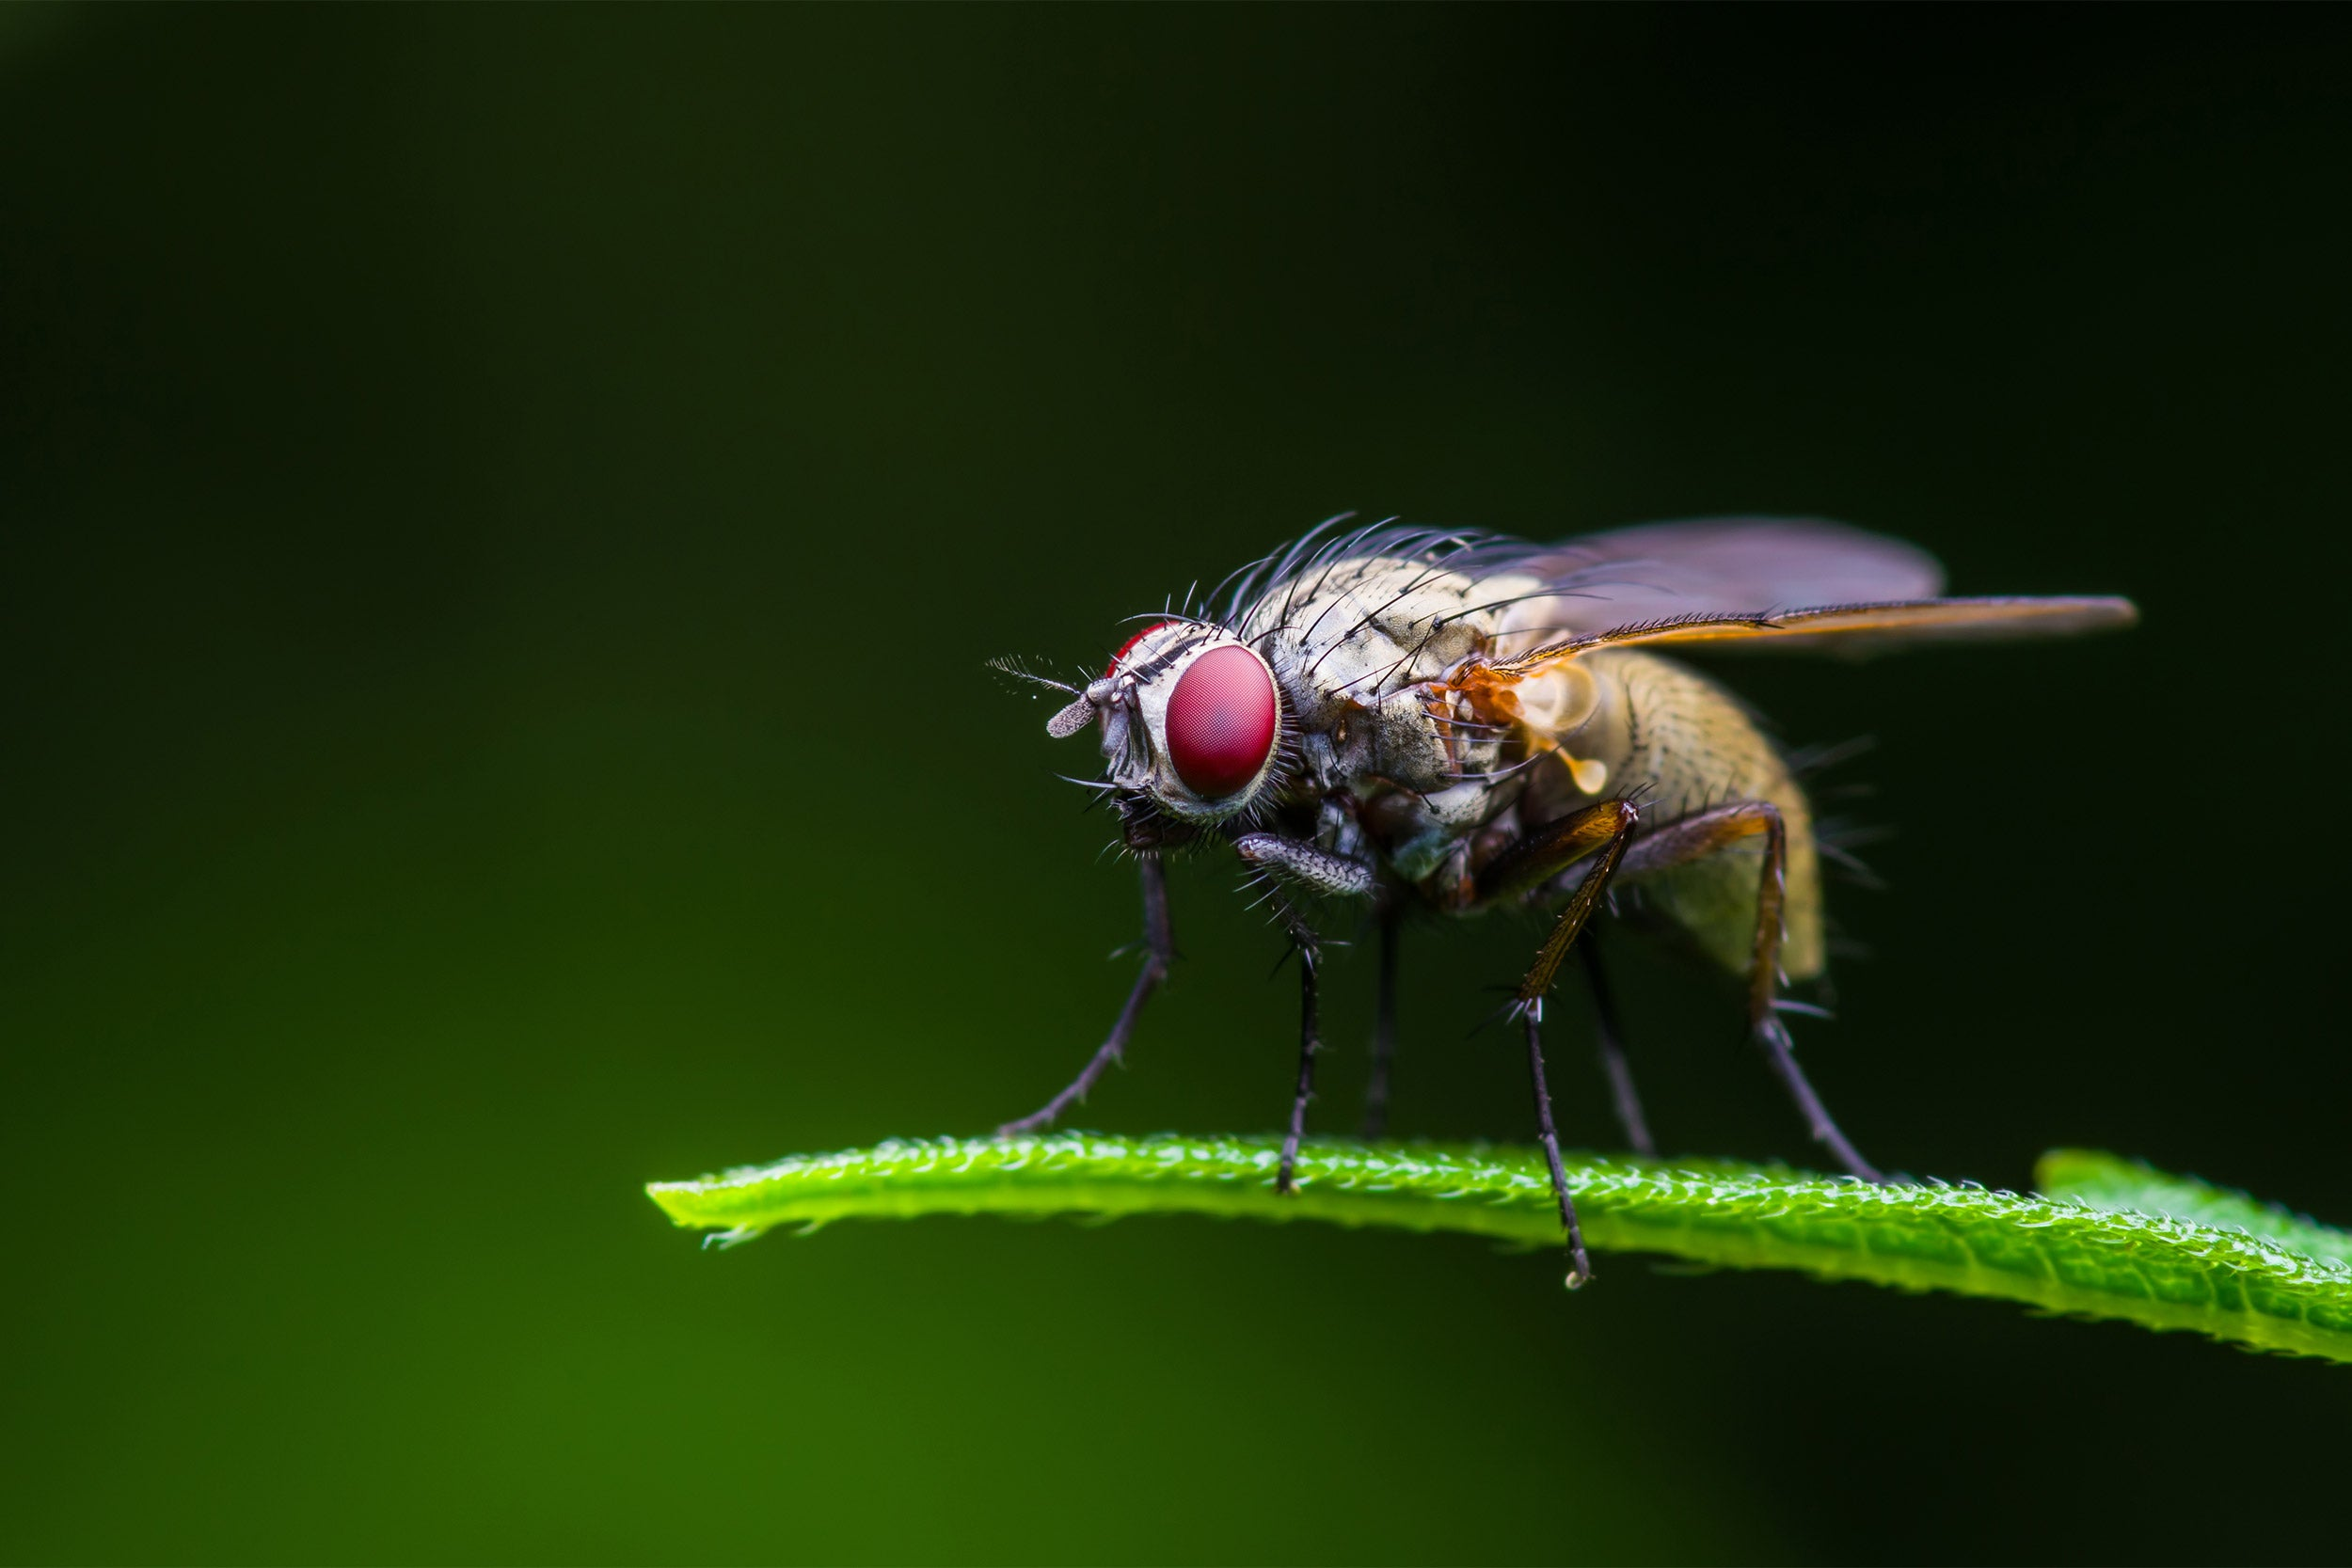 Fruit fly up close.